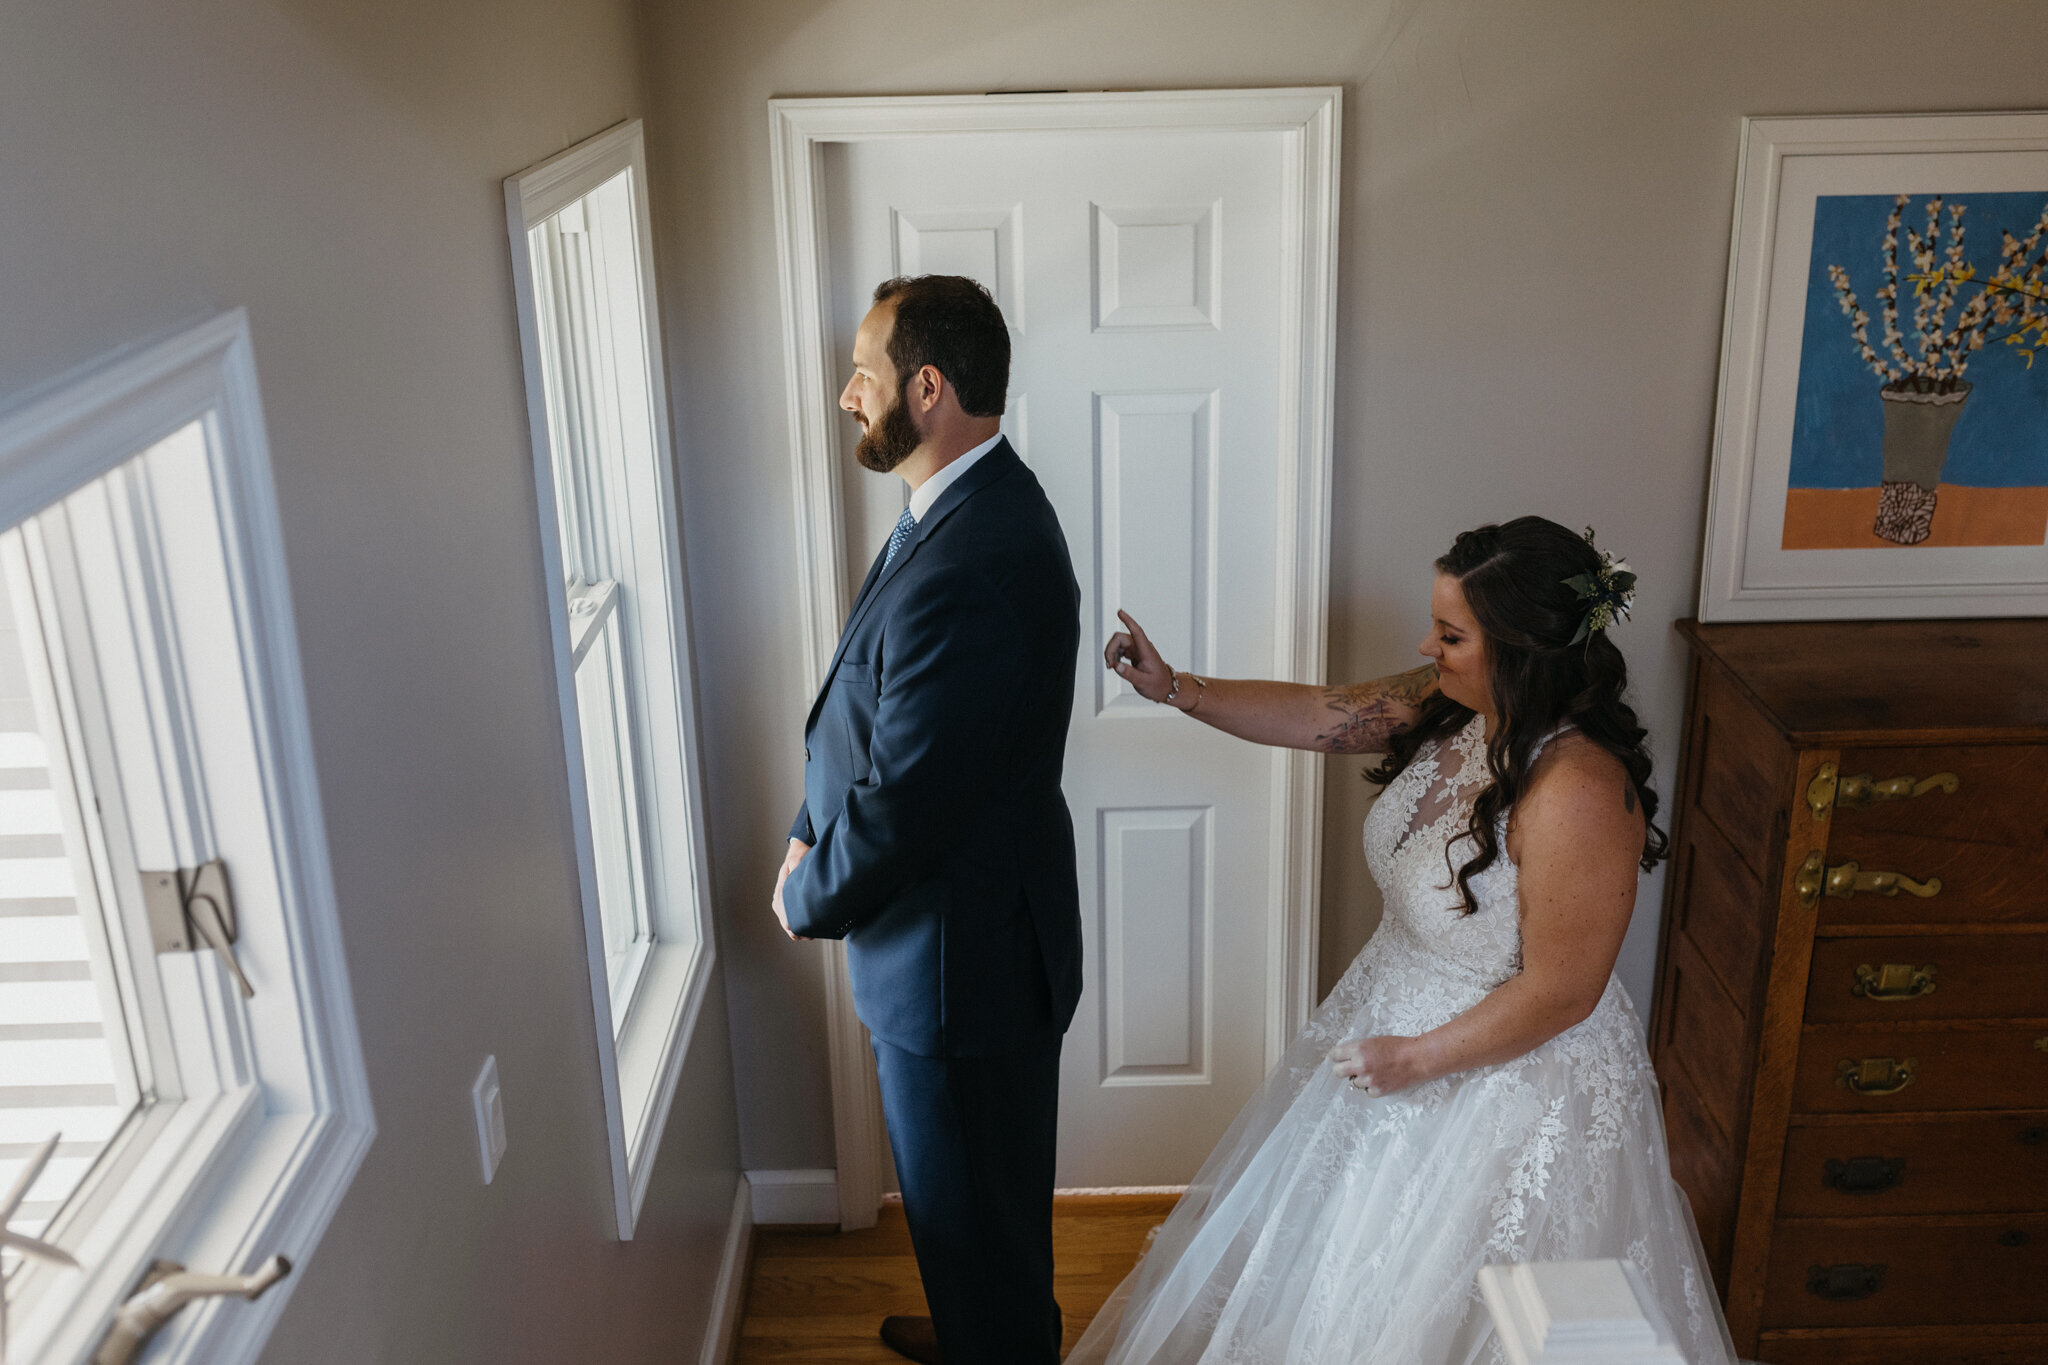 angela_jason_norfolk_wedding-50.jpg